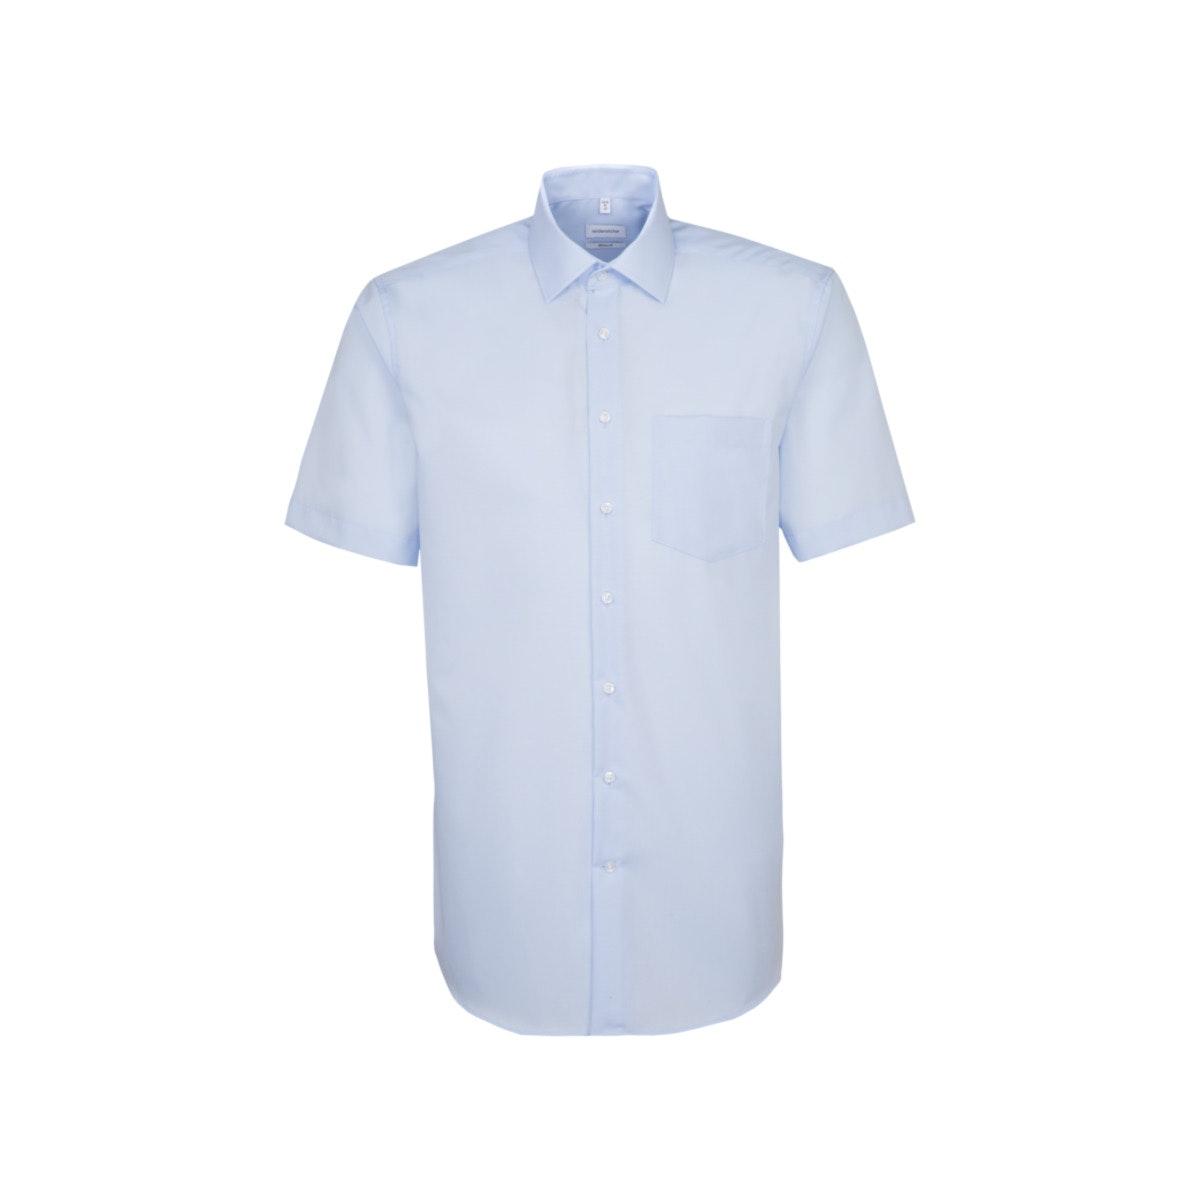 seidensticker-hemd-01-001001-12-hellblau-front